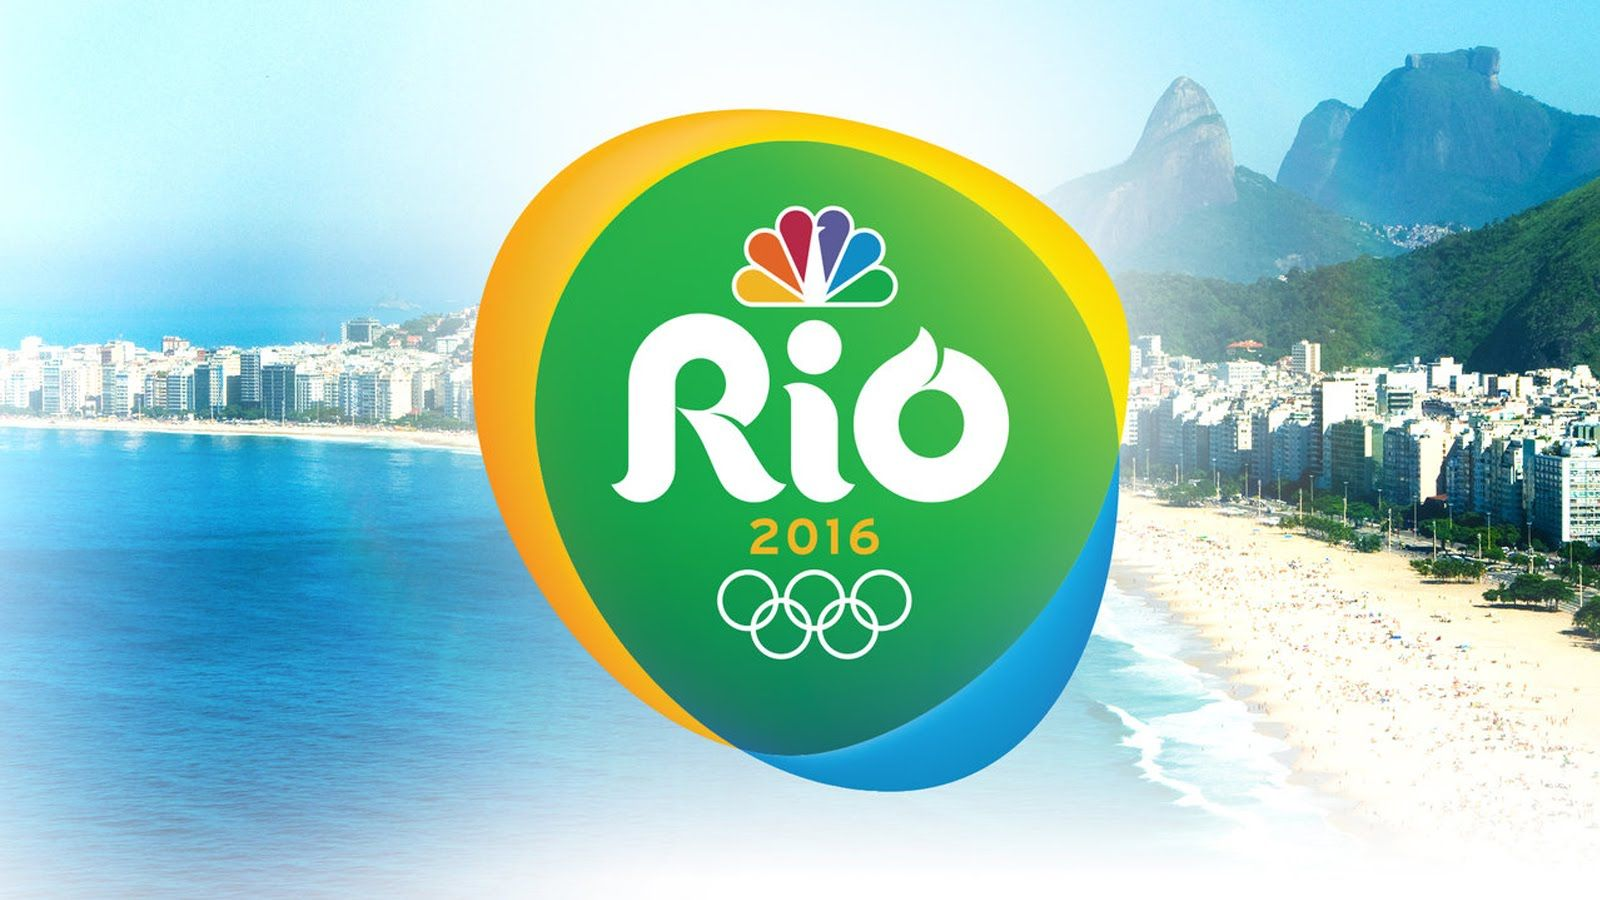 NBC Rio Olympics Theme Song Nbc olympics, Olympic theme